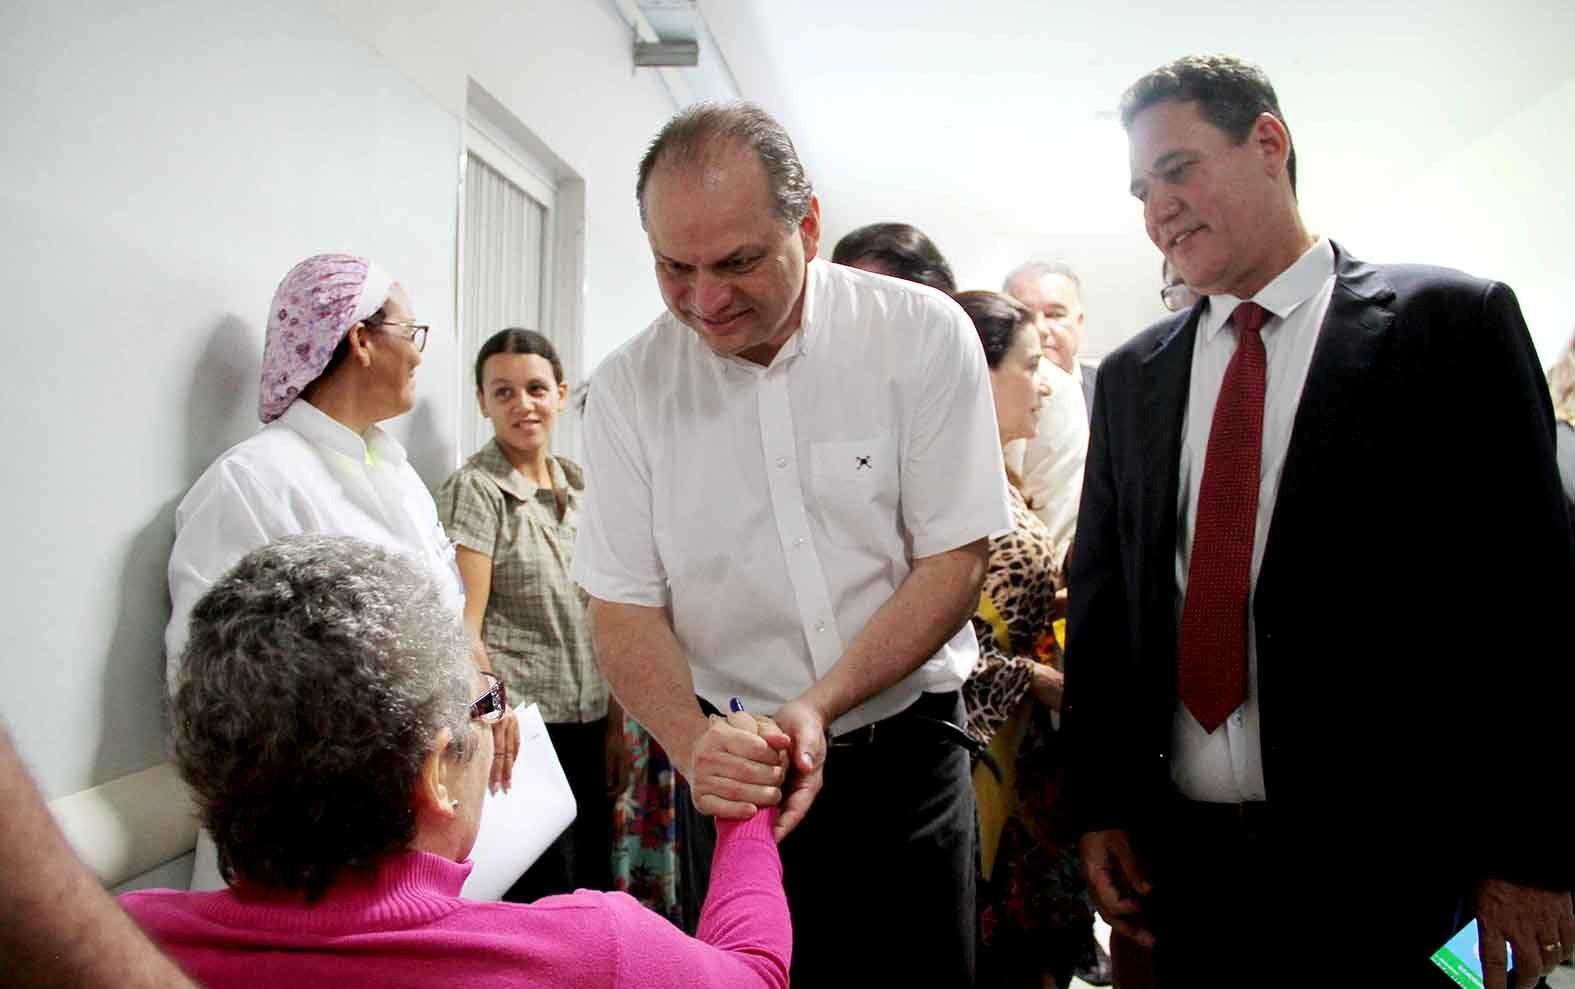 maurao-acompanha-visita-de-ministro-da-saude-ao-cosme-e-damiao-e-ao-hospital-de-base.jpg